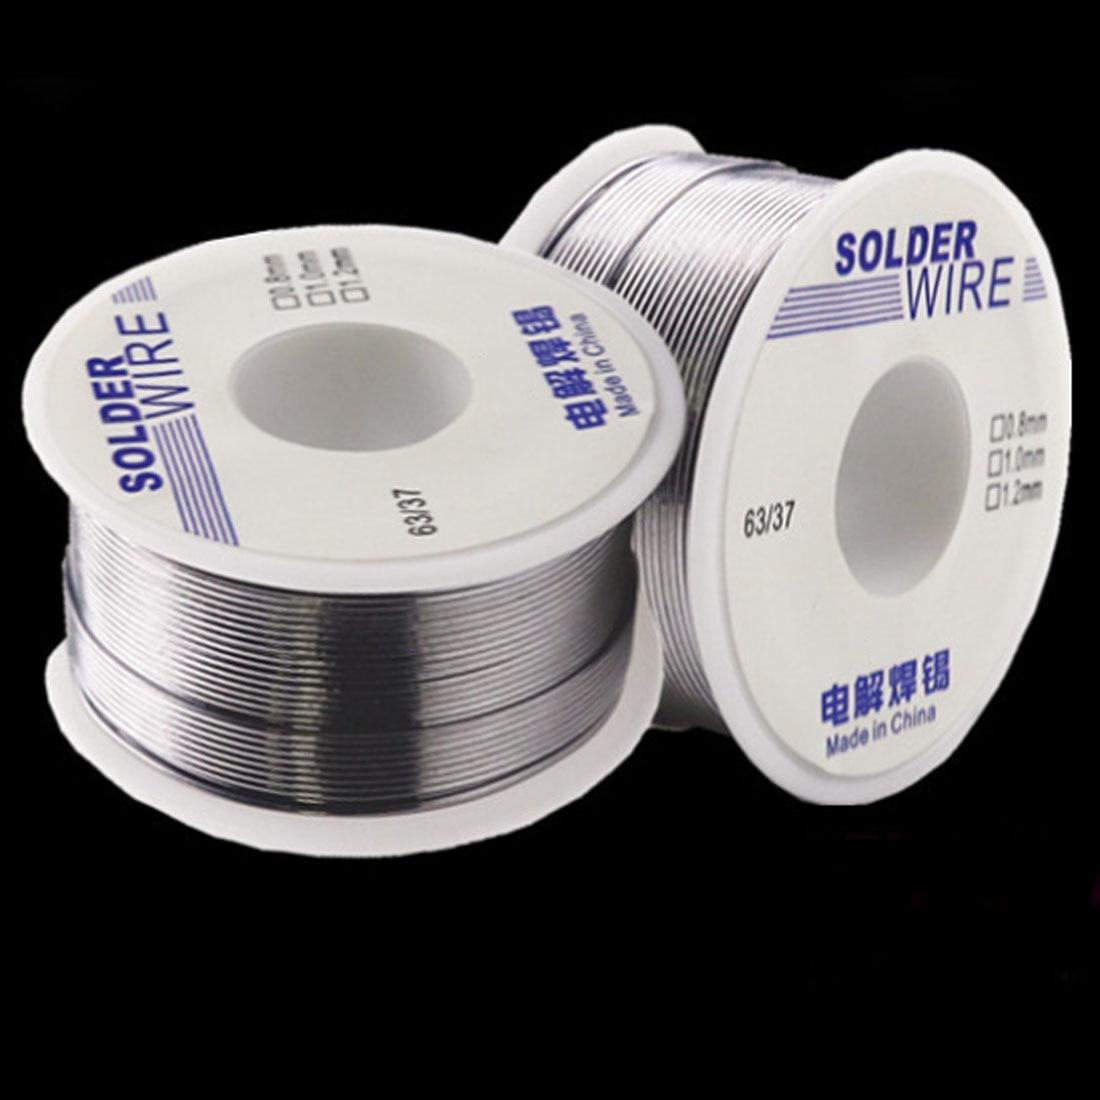 Solder Wire 6337 50g 1.0mm0.8mm 2.0-2.3 % Flux Rosin Core Weldring Tin Lead Clean Rosin Core Welding Tin Lead Solder